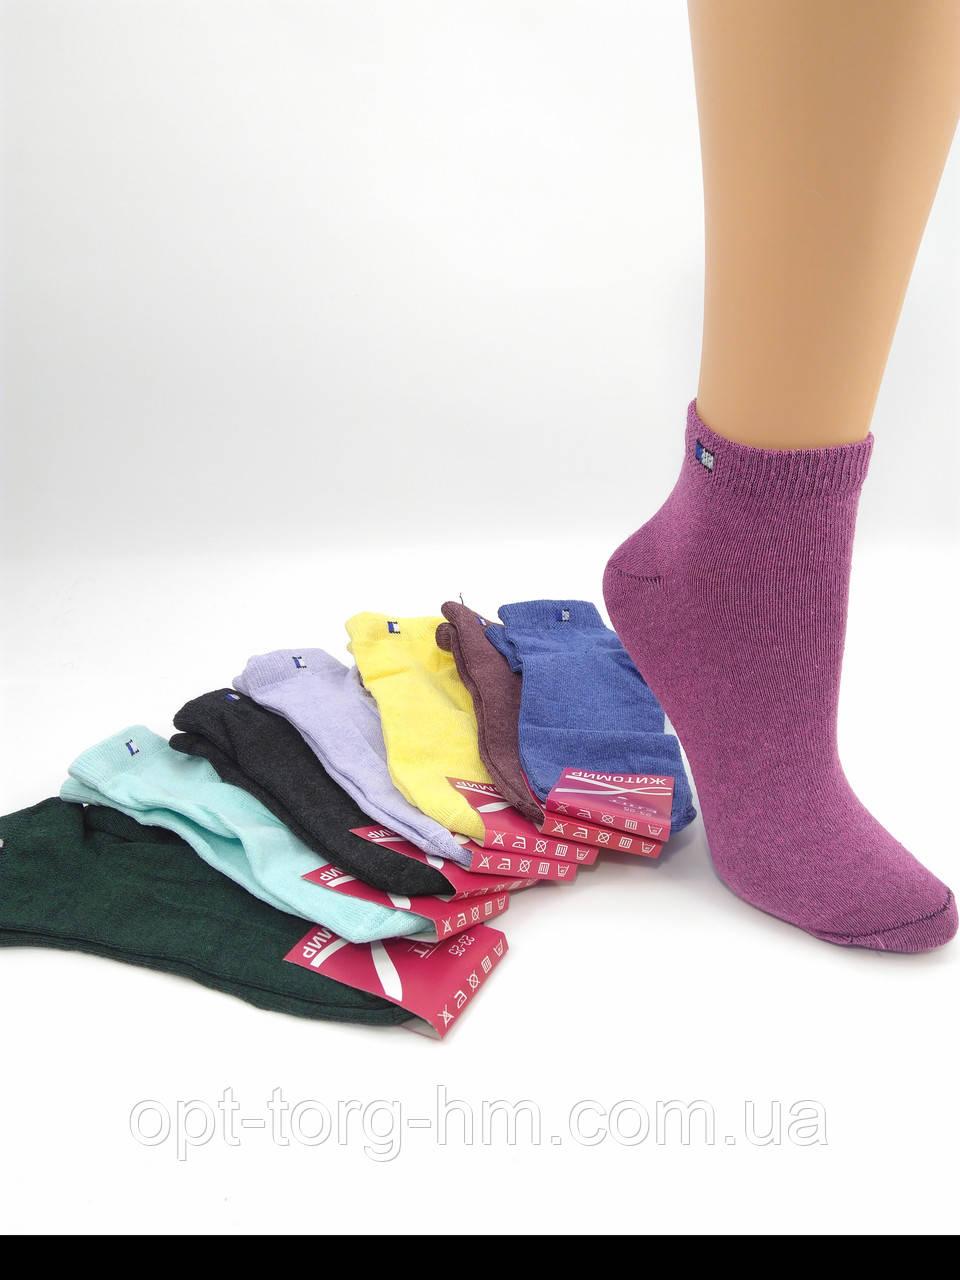 Женские спортивные носки Toмми